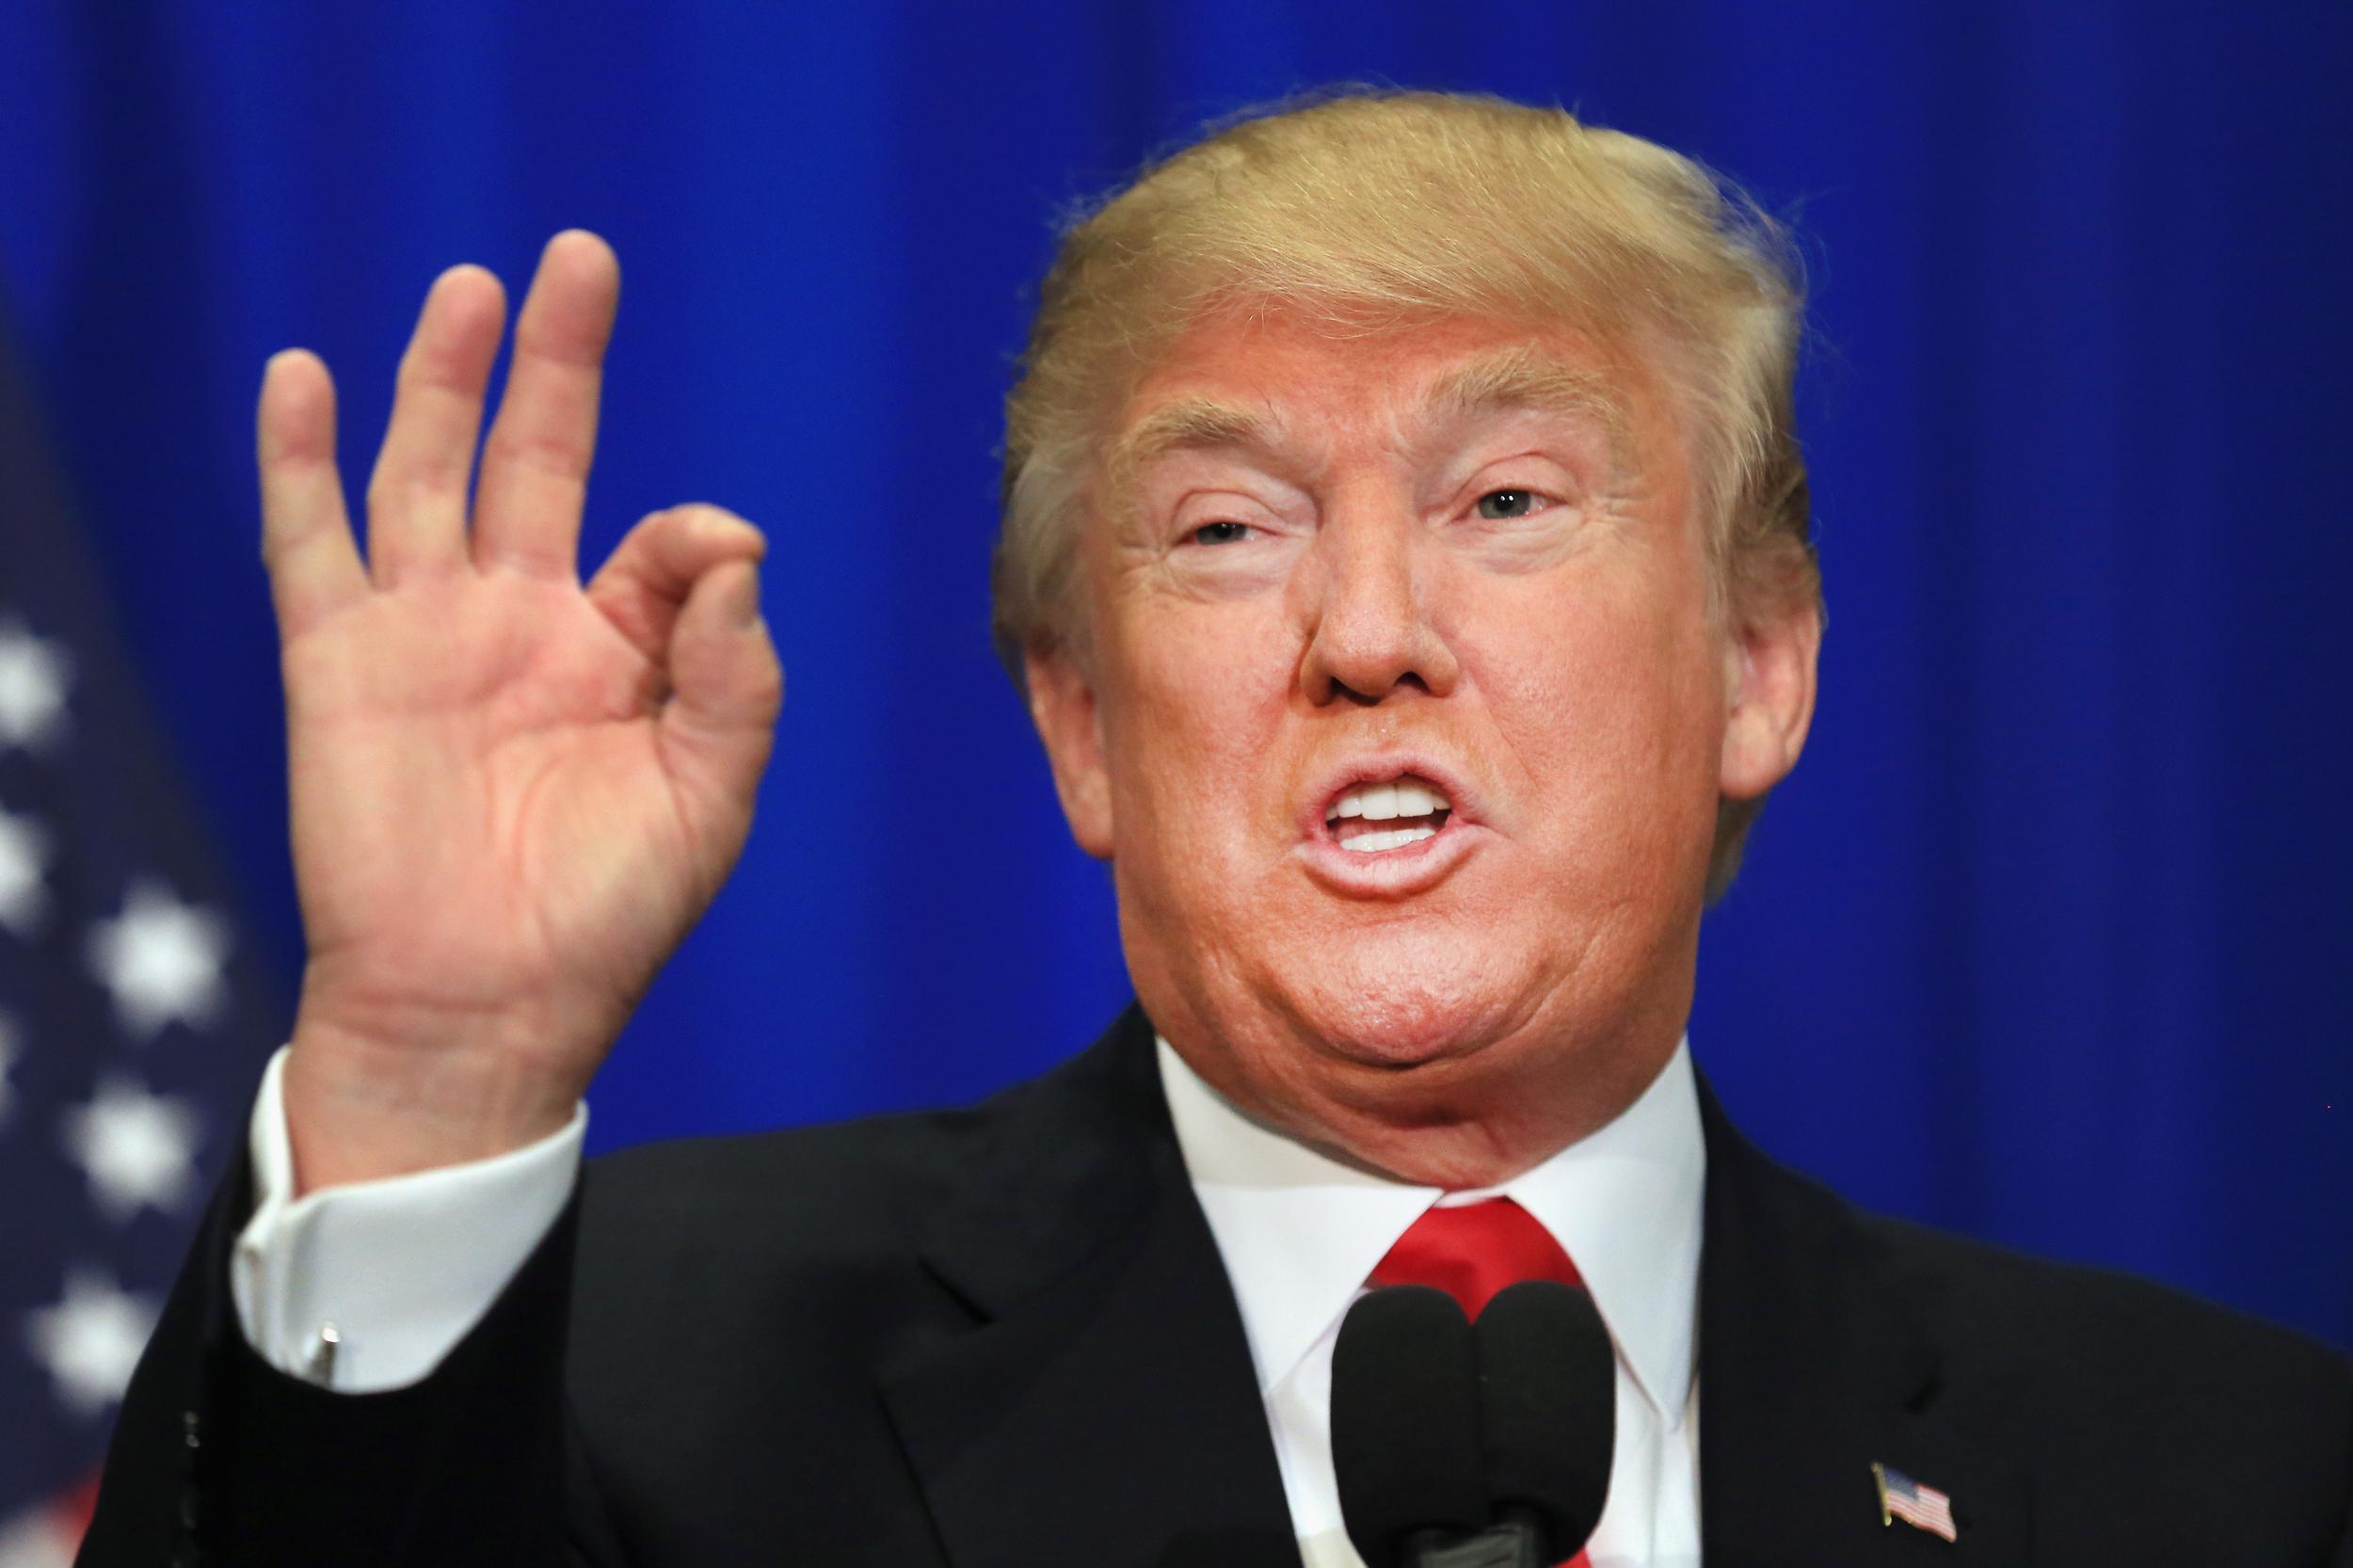 Donald Trump quer devolver poder à igreja